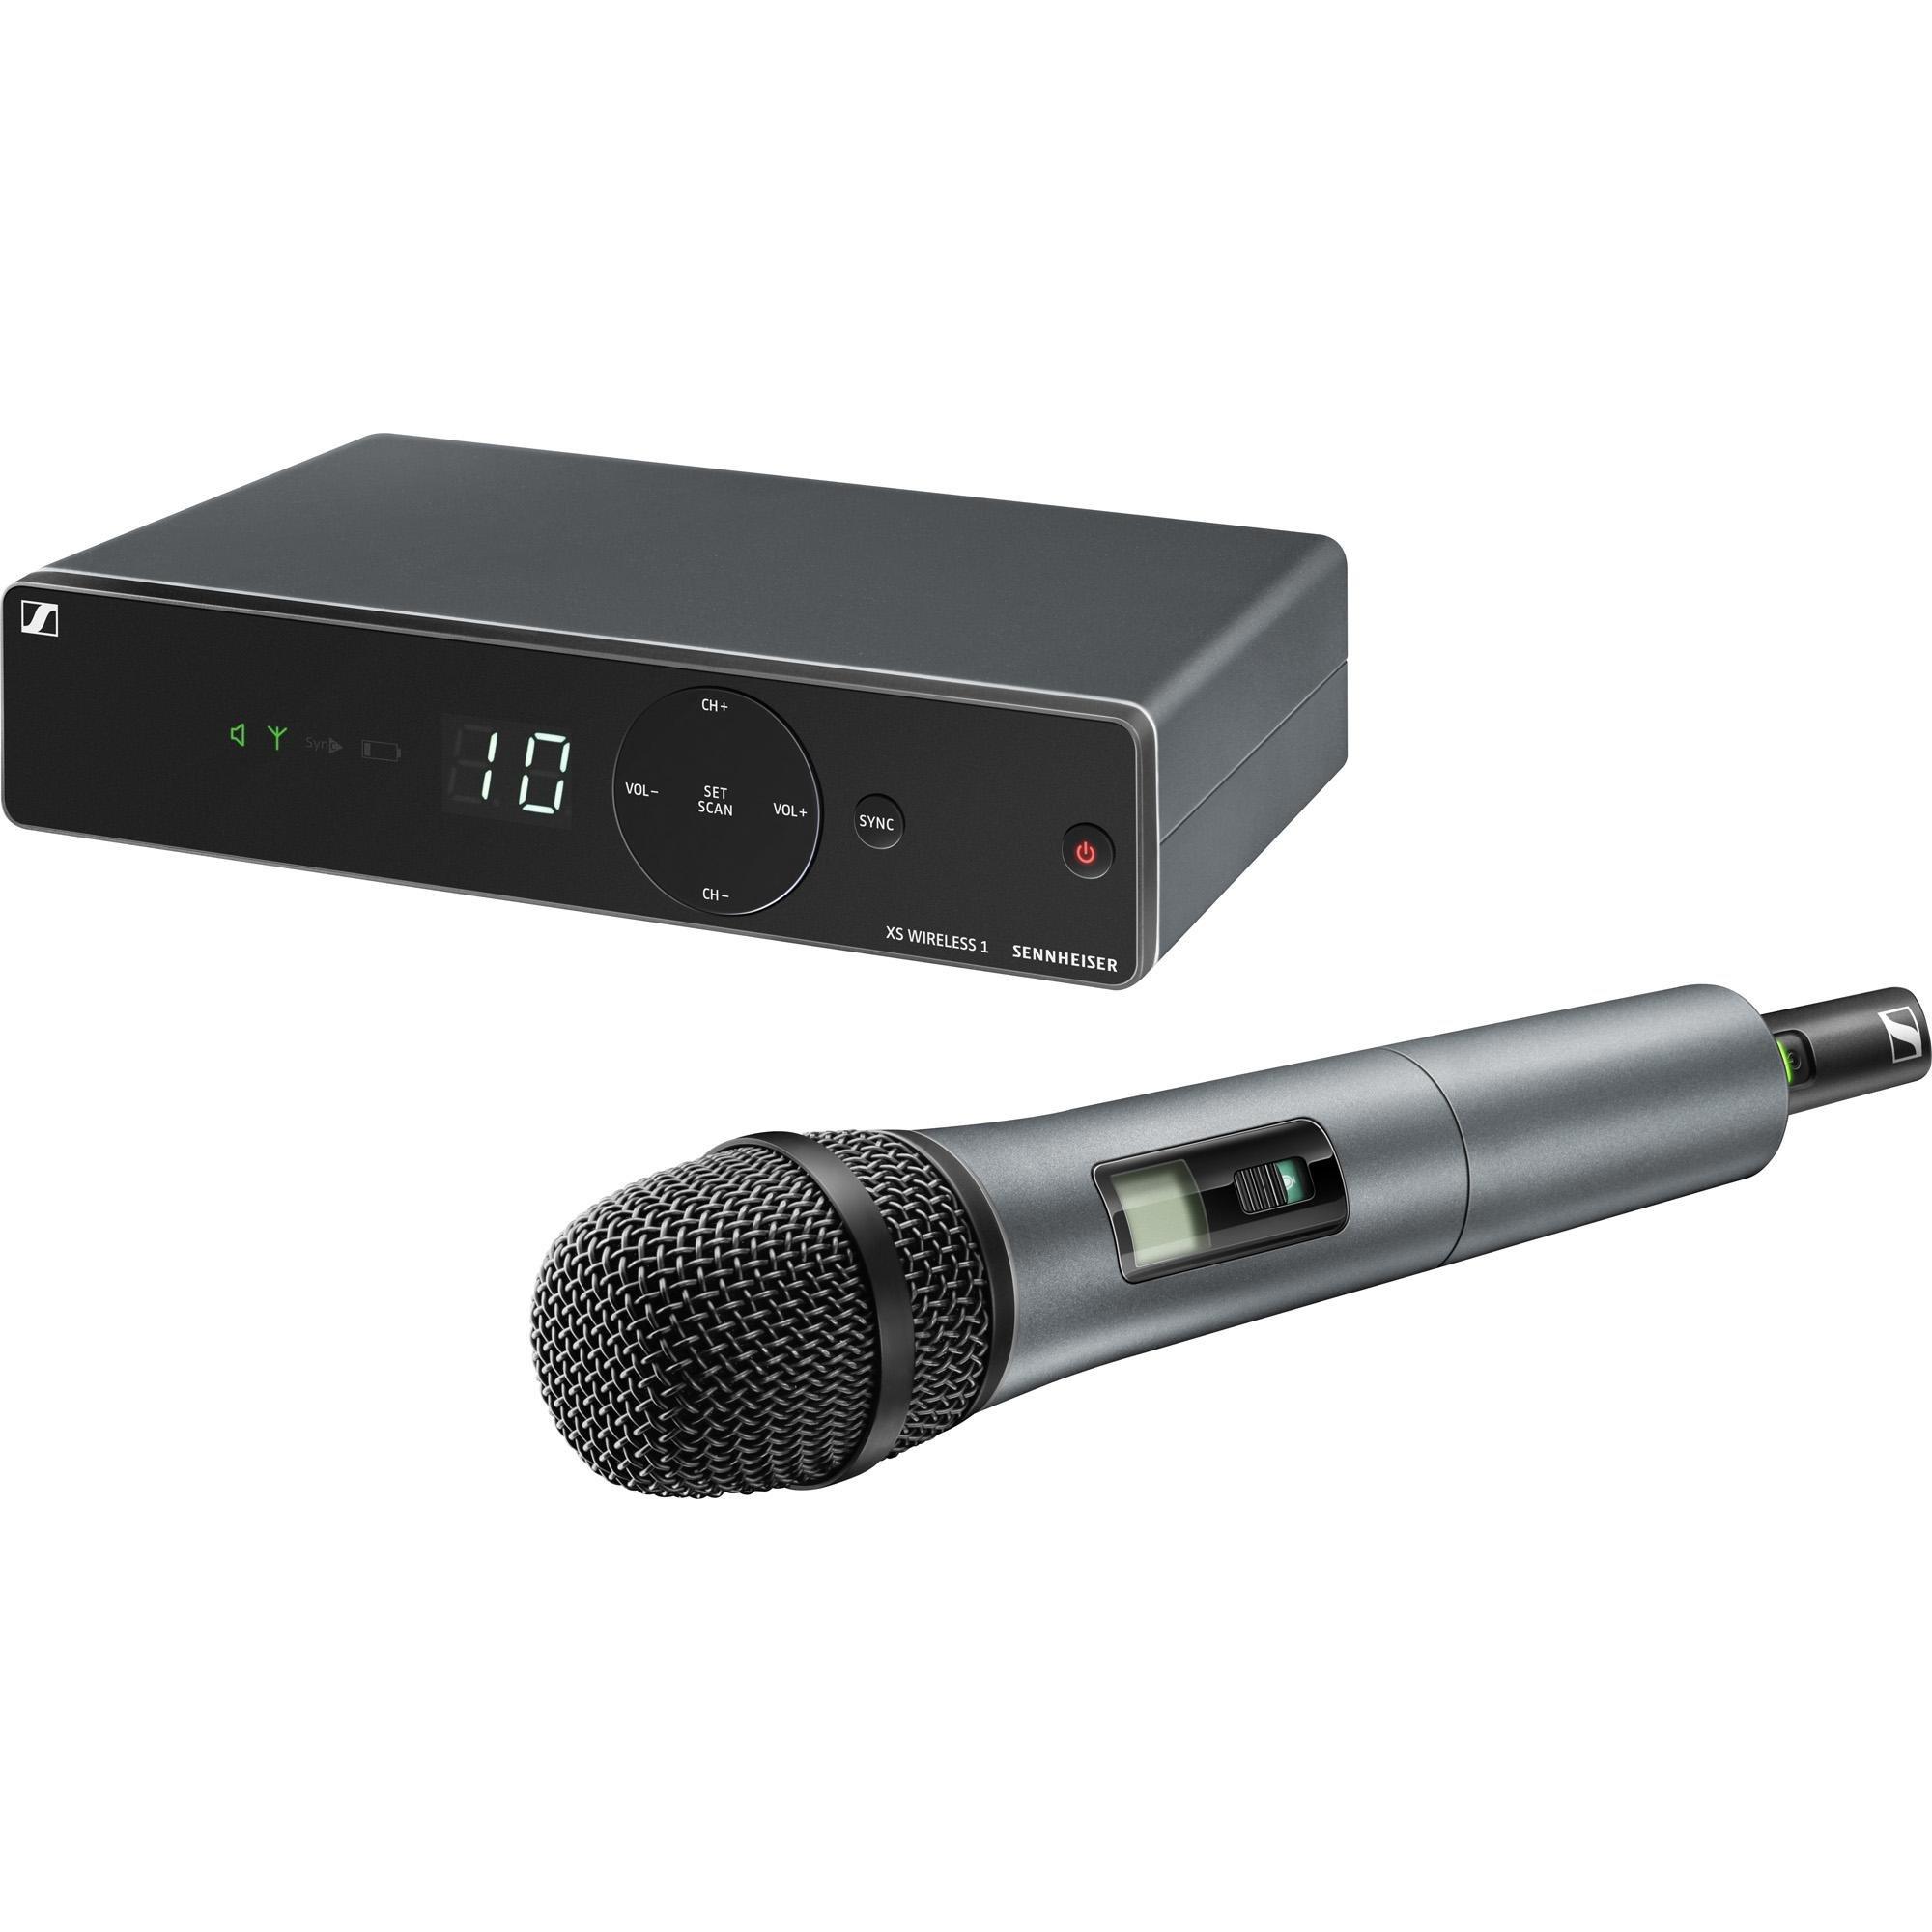 Microfone sem Fio XSW1-825-A SENNHEISER